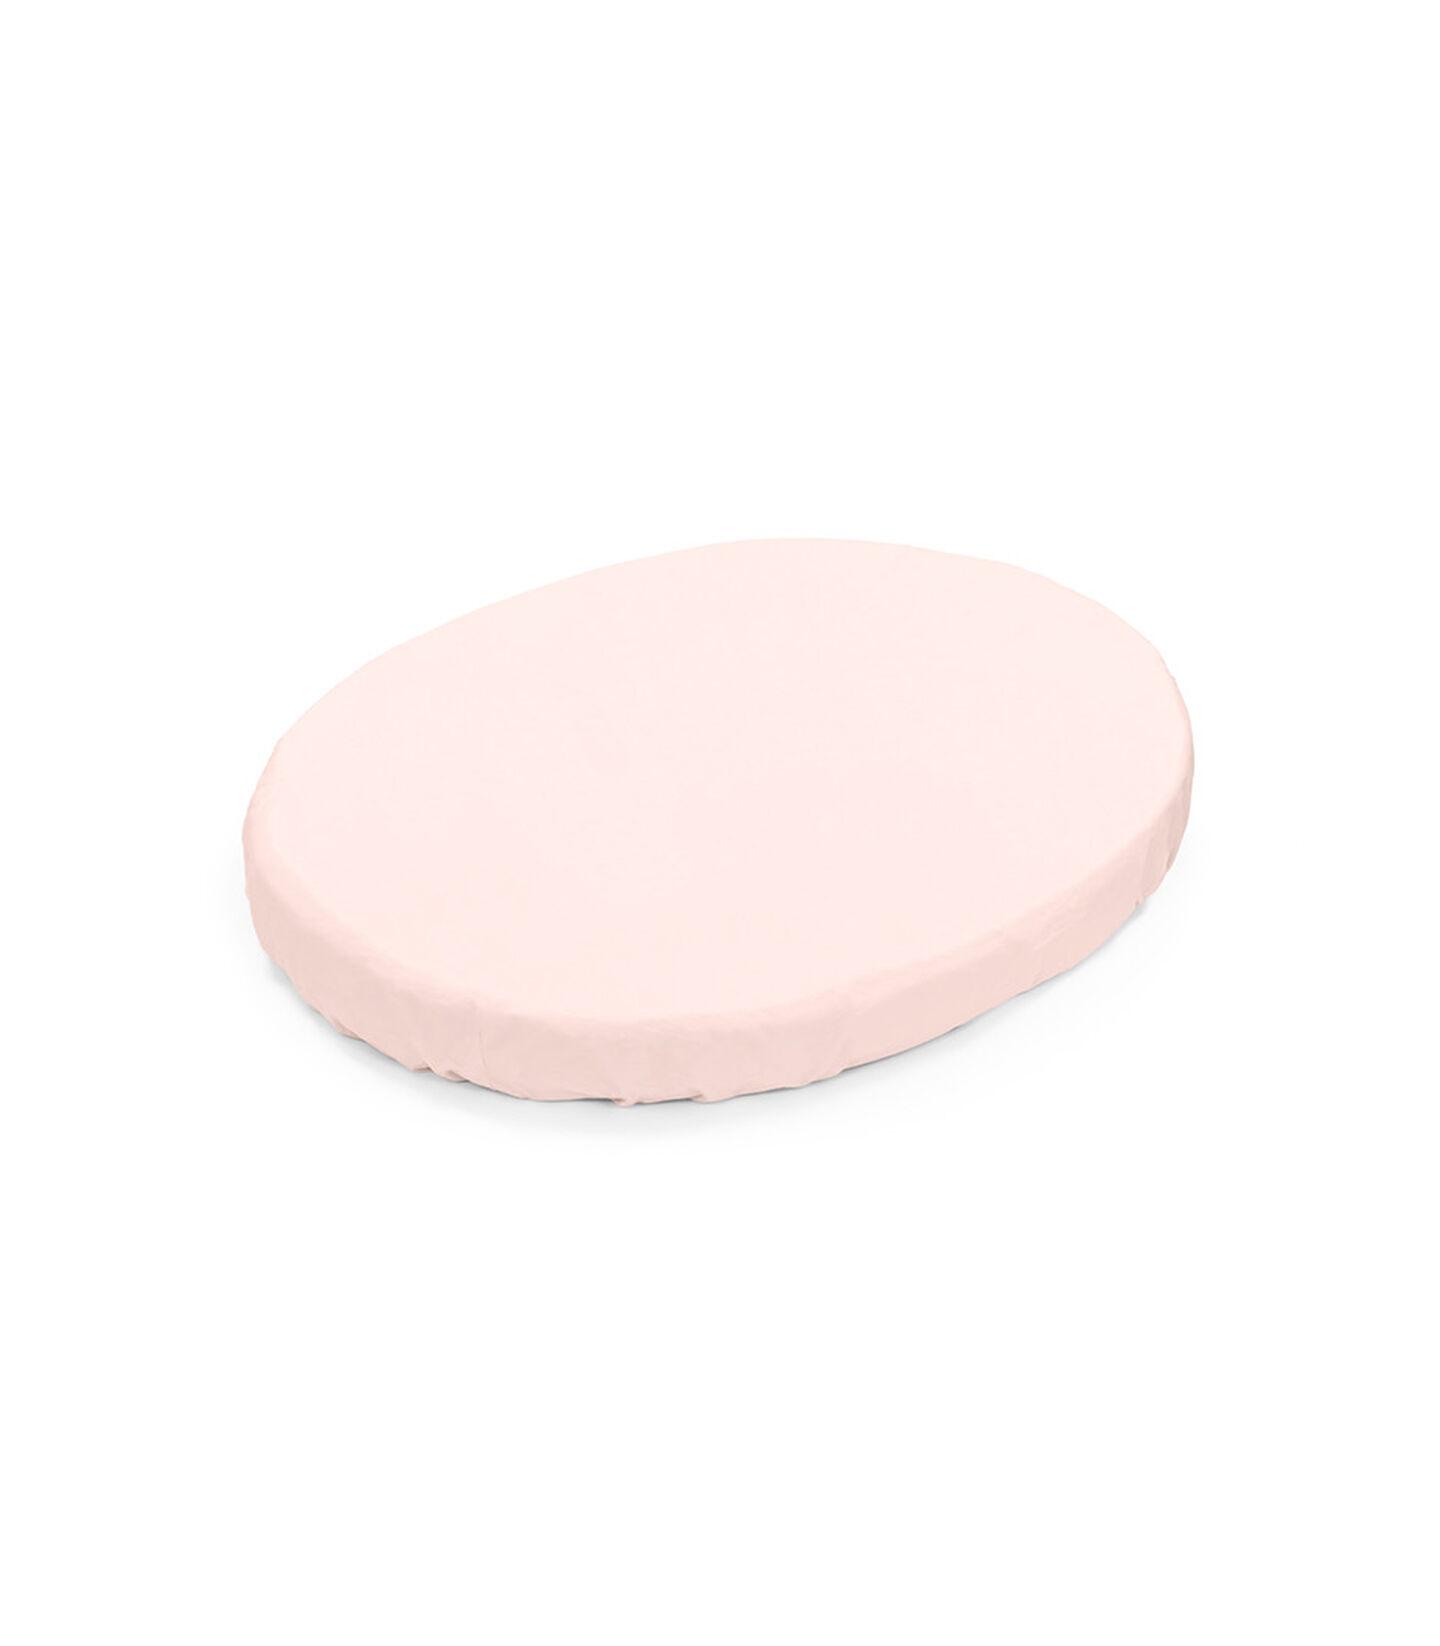 Stokke® Sleepi™ Mini Formsyet lagen Peachy Pink, Peachy Pink, mainview view 1